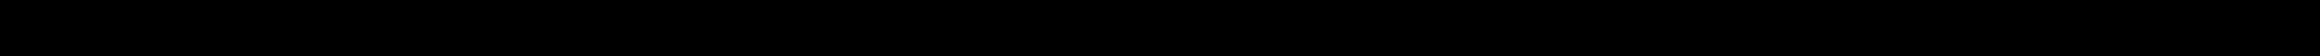 LuK 028 141 036 R, 028 141 036 T, 02A 141 165 A, 02A 141 165 B, 02A 141 165 D Komplet sklopke